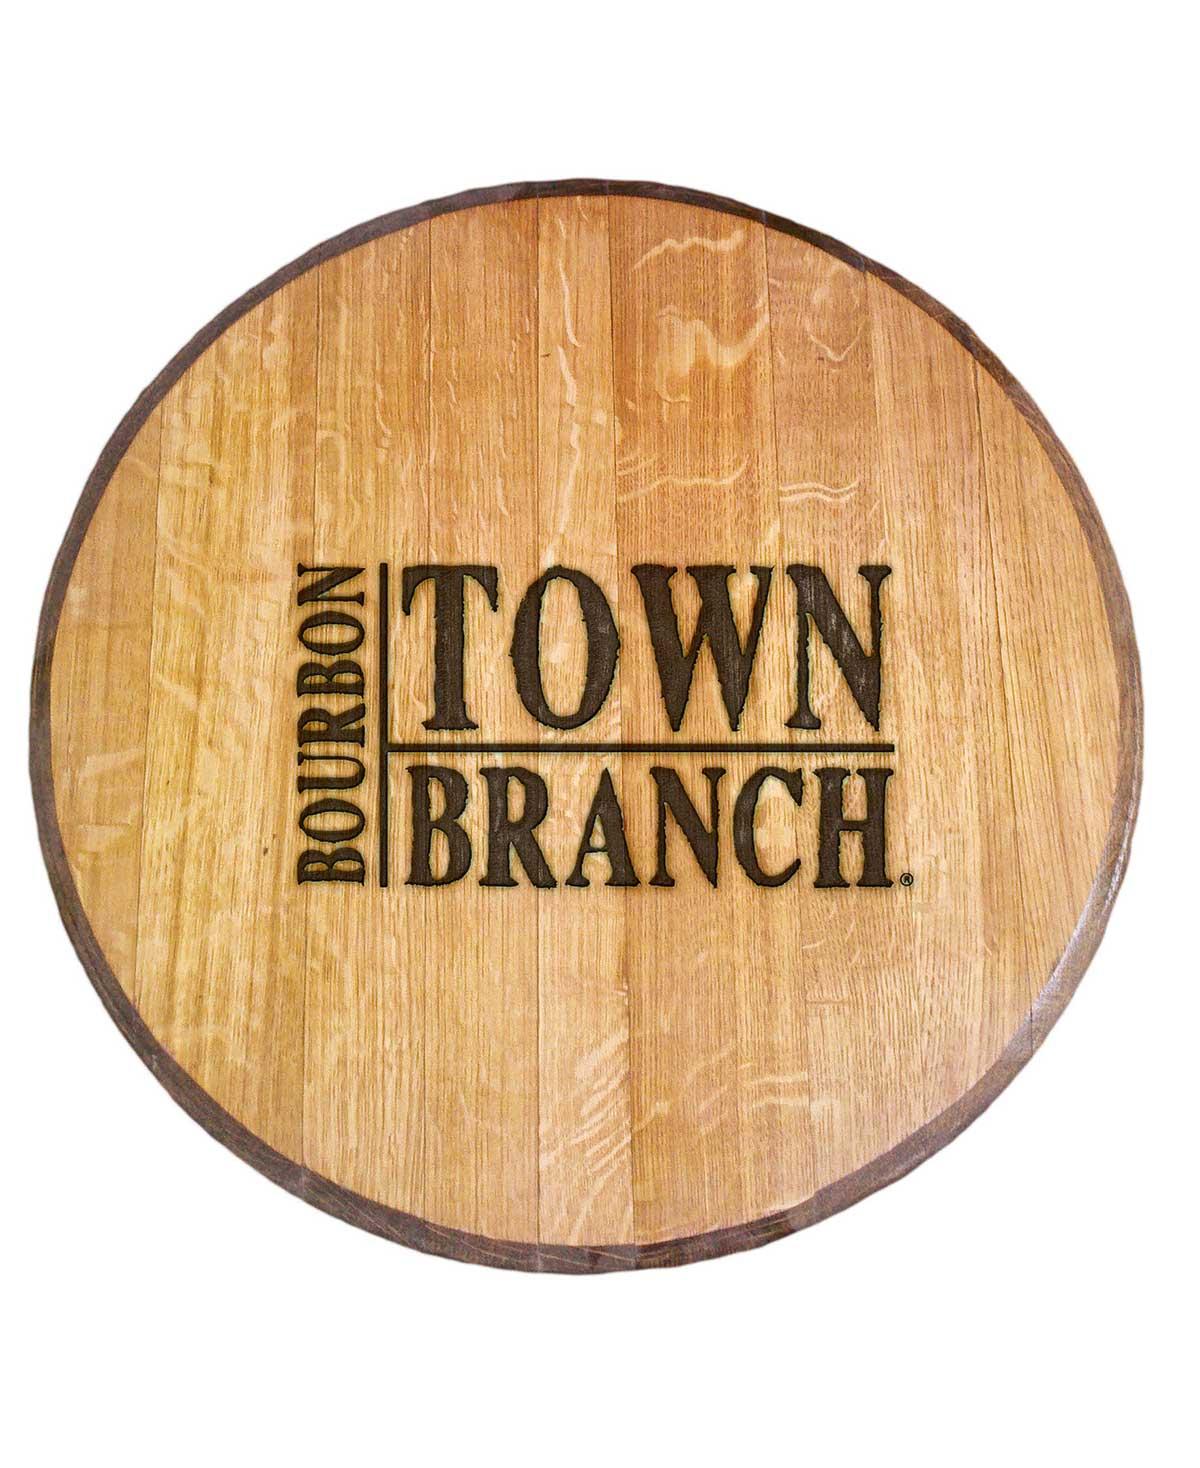 Town Branch Bourbon Barrel Head